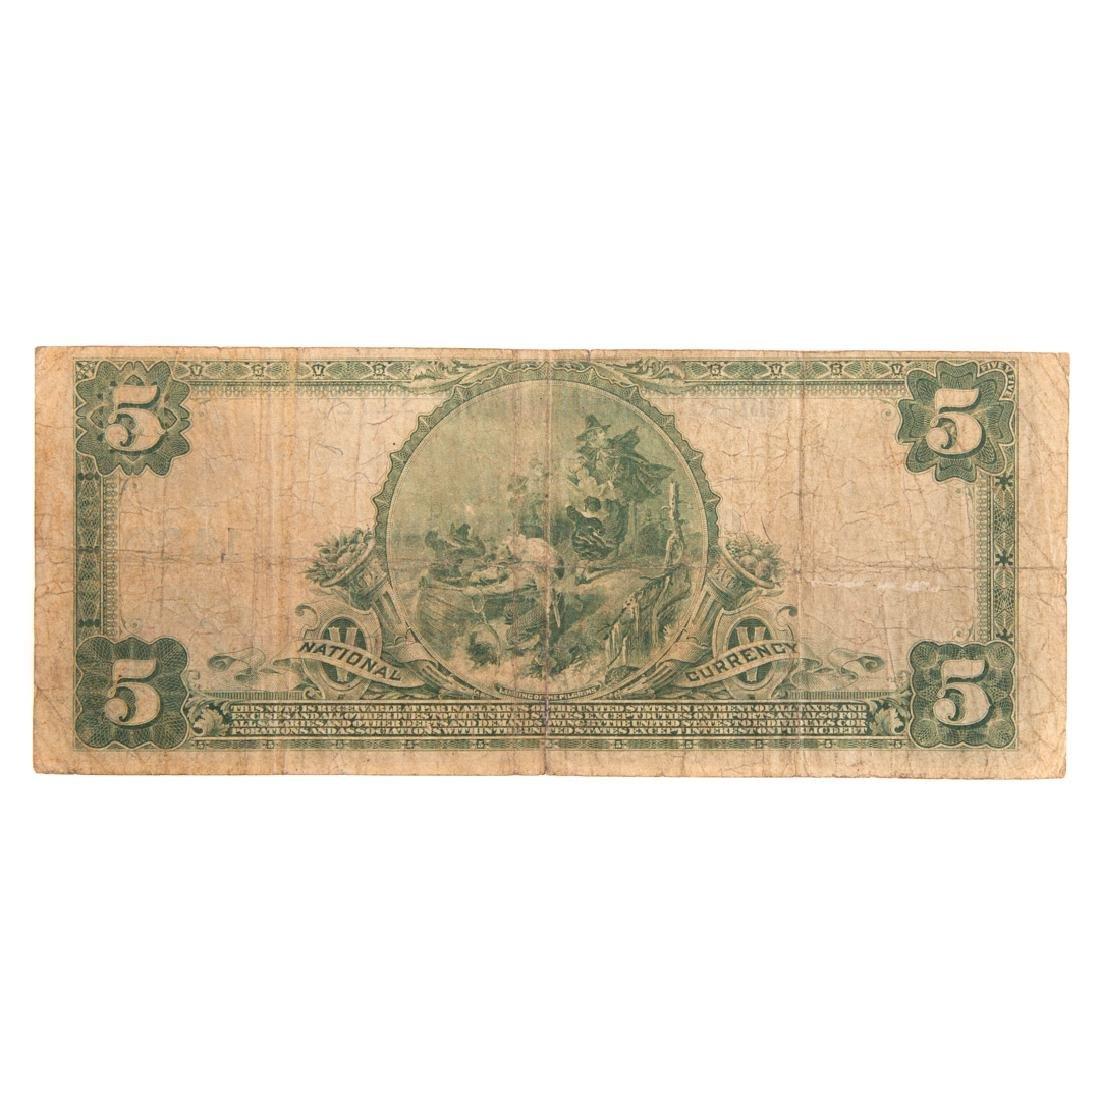 [US] 1902 $5 Plain Back Ch# 1432 FR-598 Baltimore - 2